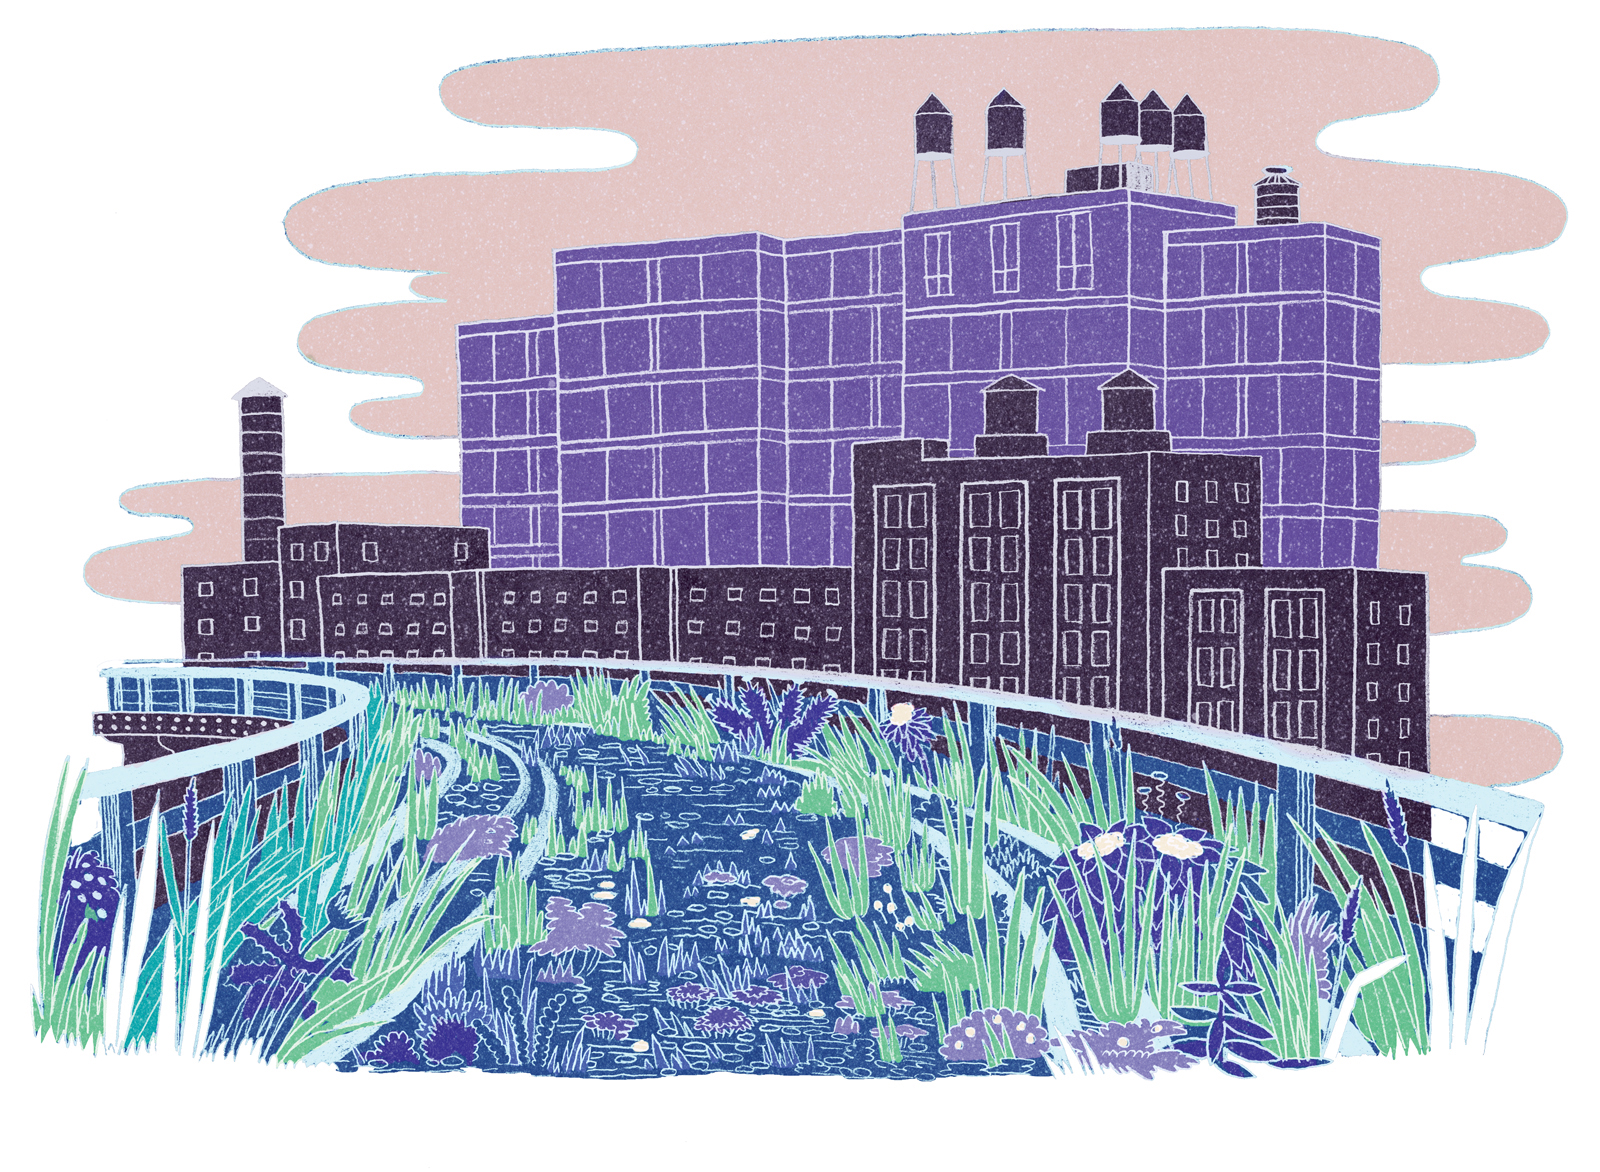 101 building illustration